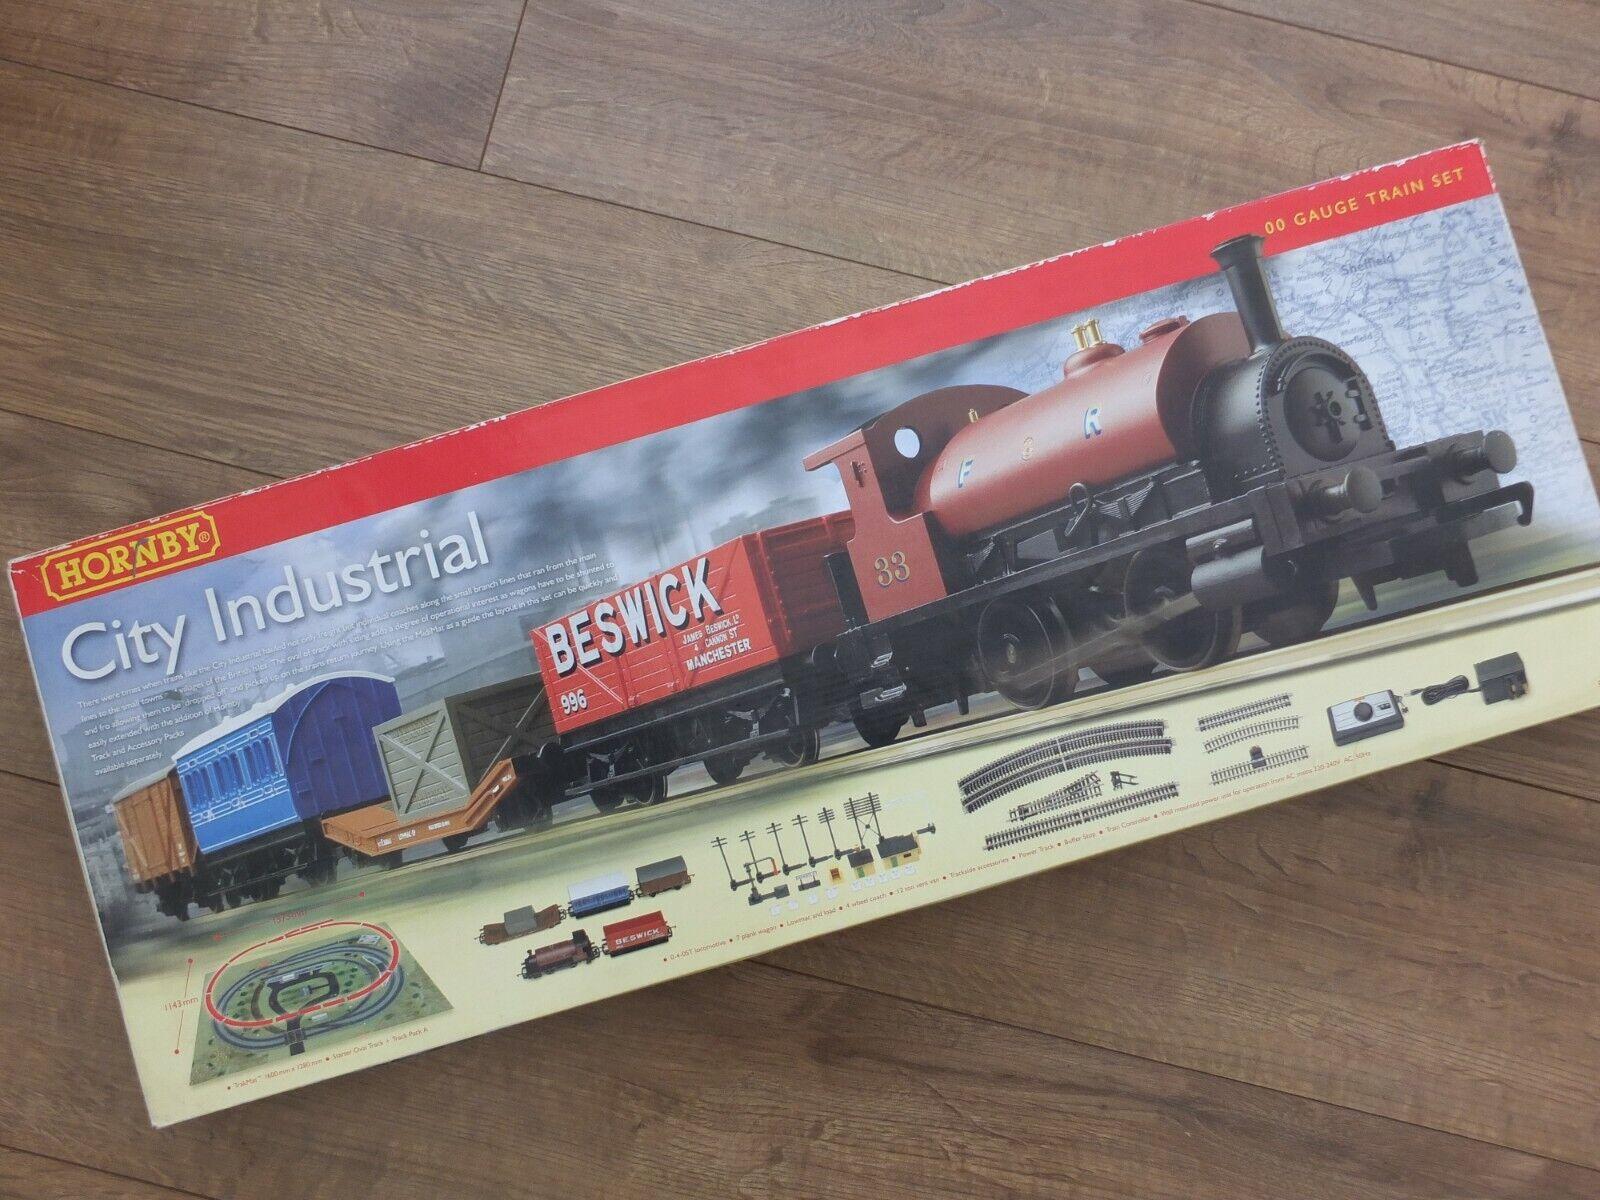 Venta barata Hornby R1127 OO Gauge City Industrial Industrial Industrial Train Set -  Mint & Boxed  de moda